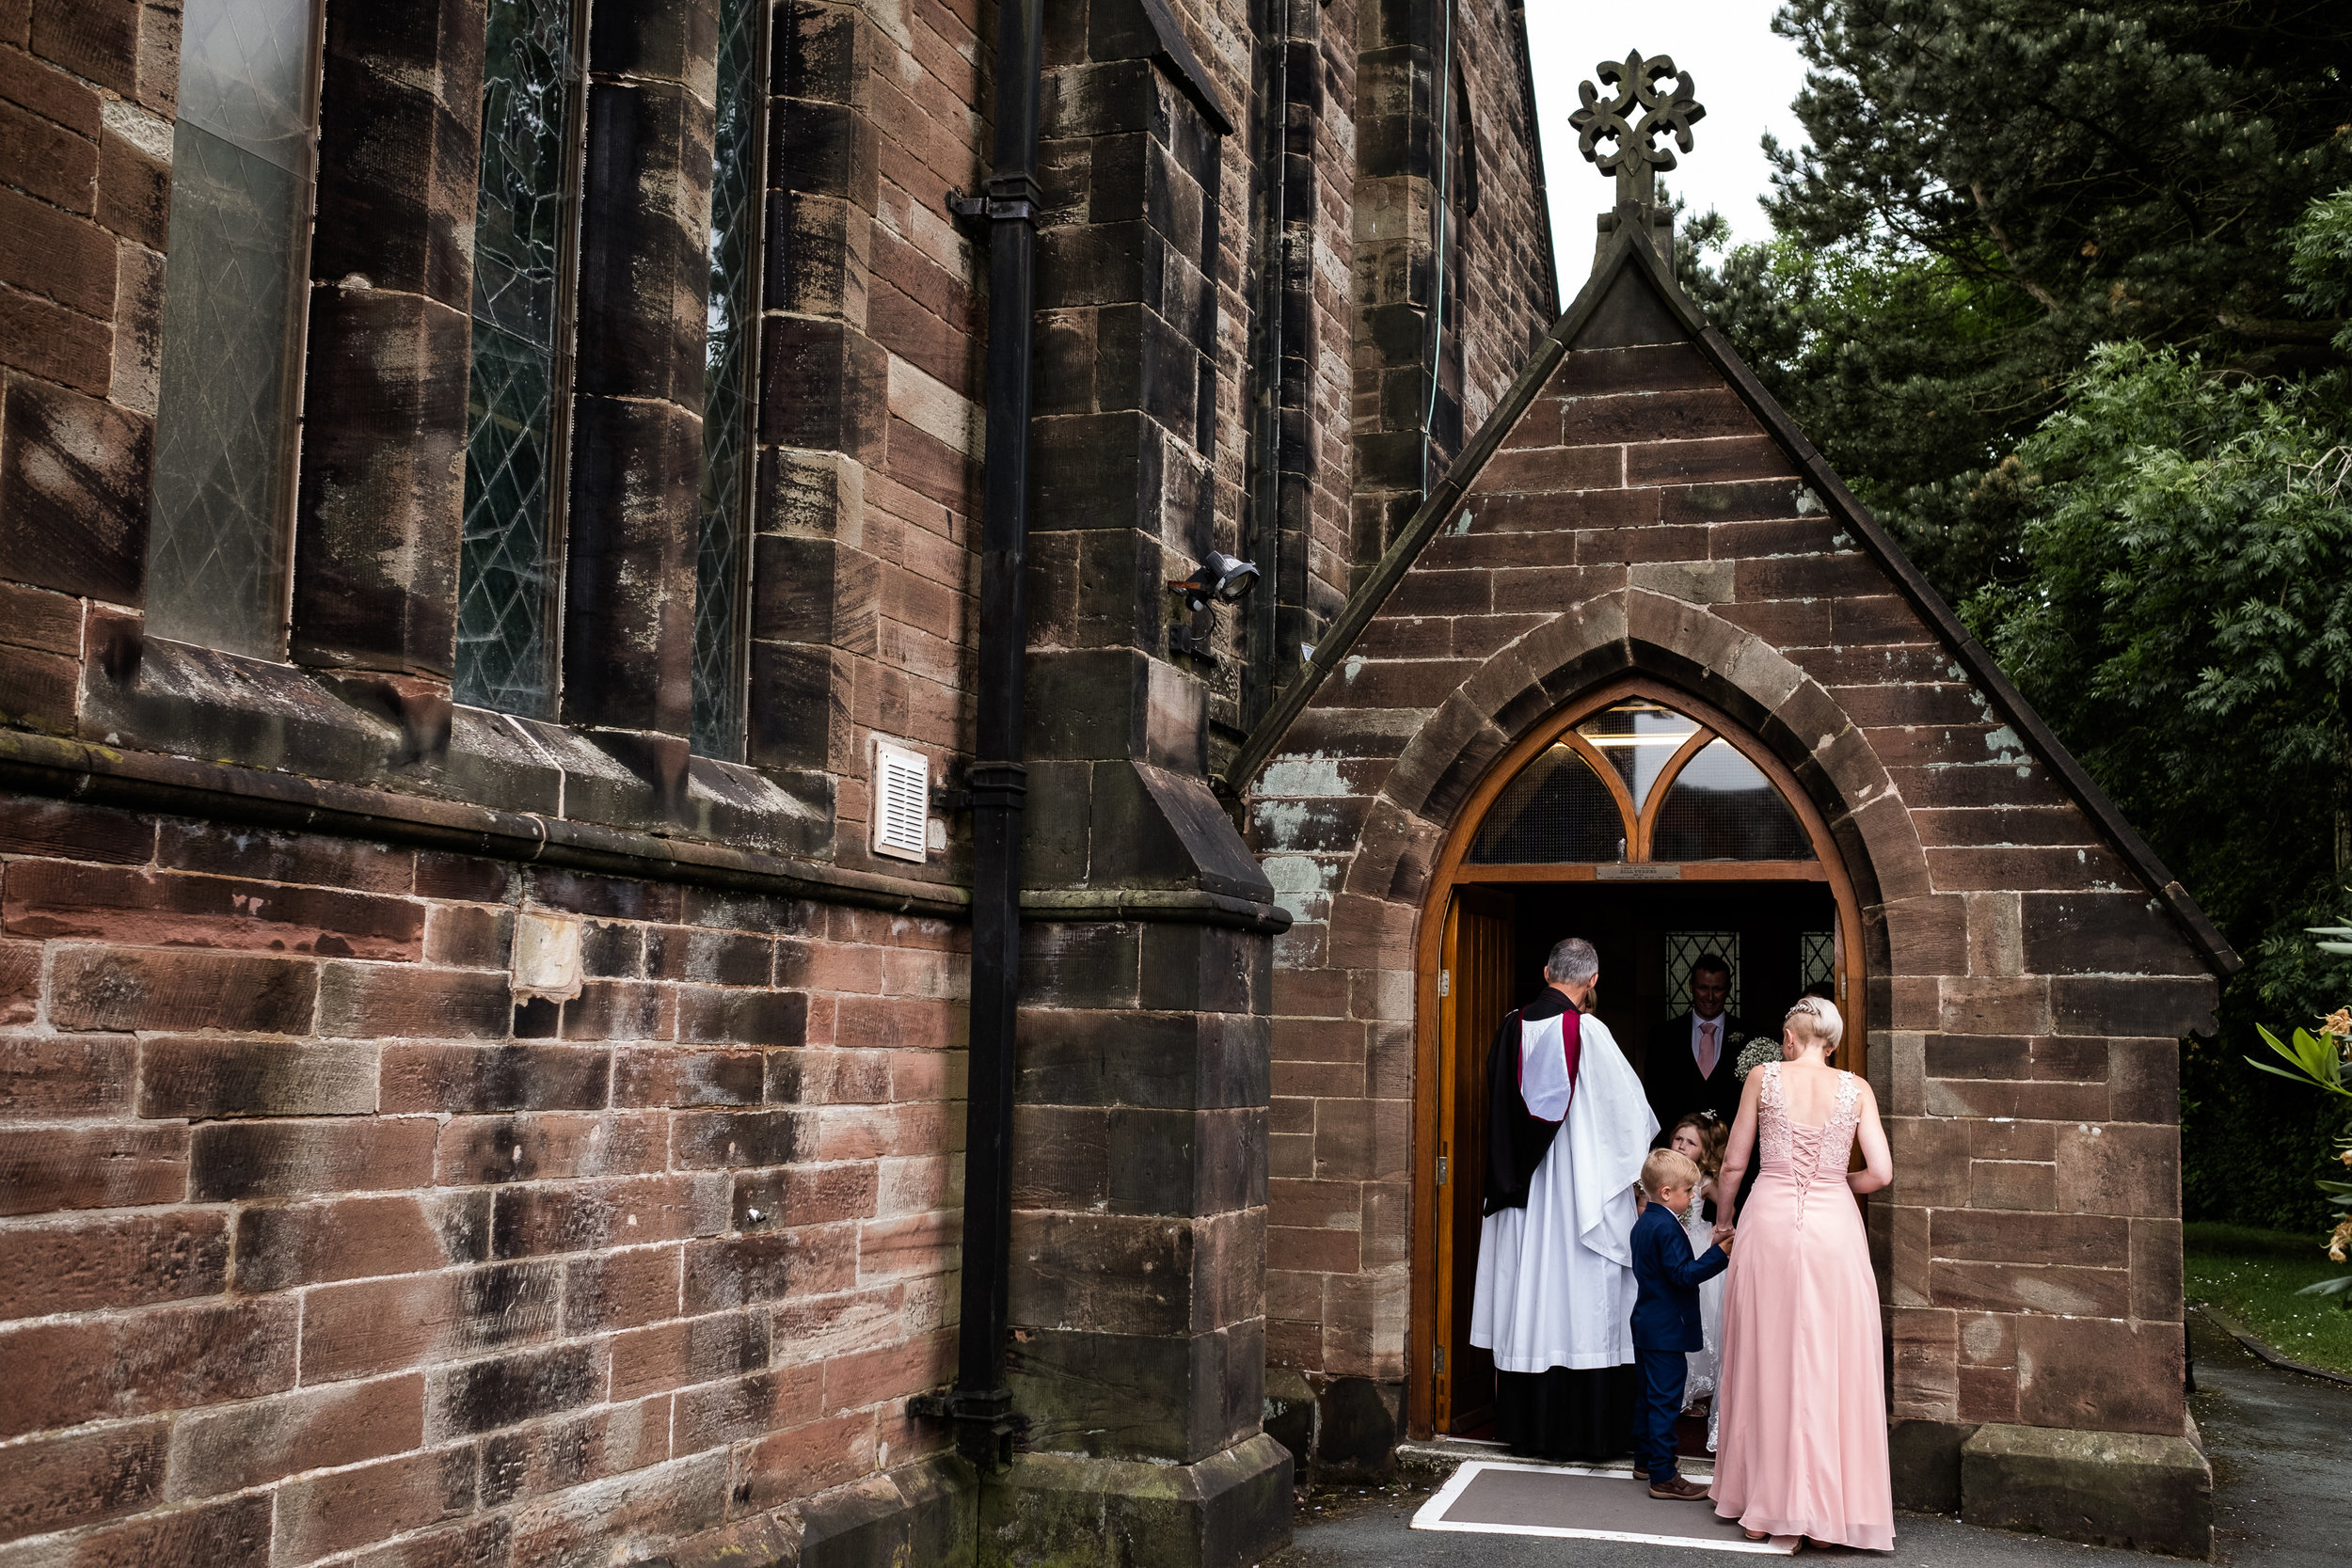 Summer Documentary Wedding Photography Floral Hall, Stoke-on-Trent, Staffordshire - Jenny Harper-21.jpg